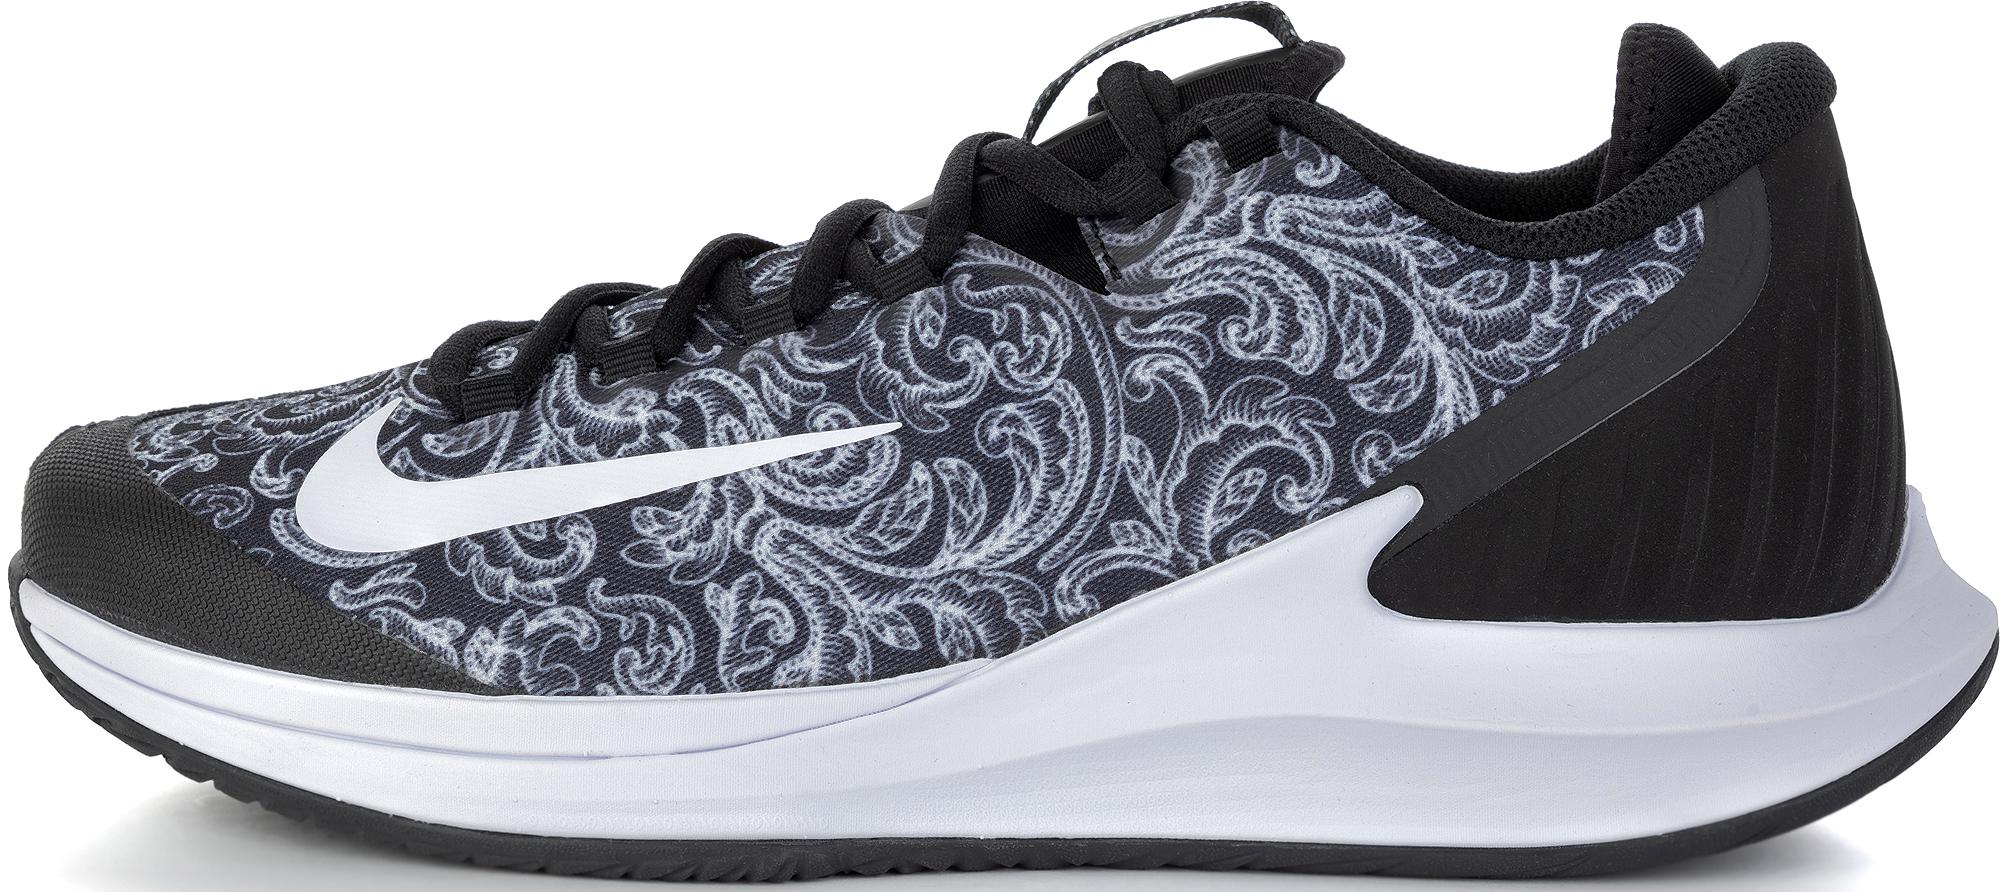 Nike Кроссовки мужские Nike Zoom Zero, размер 45